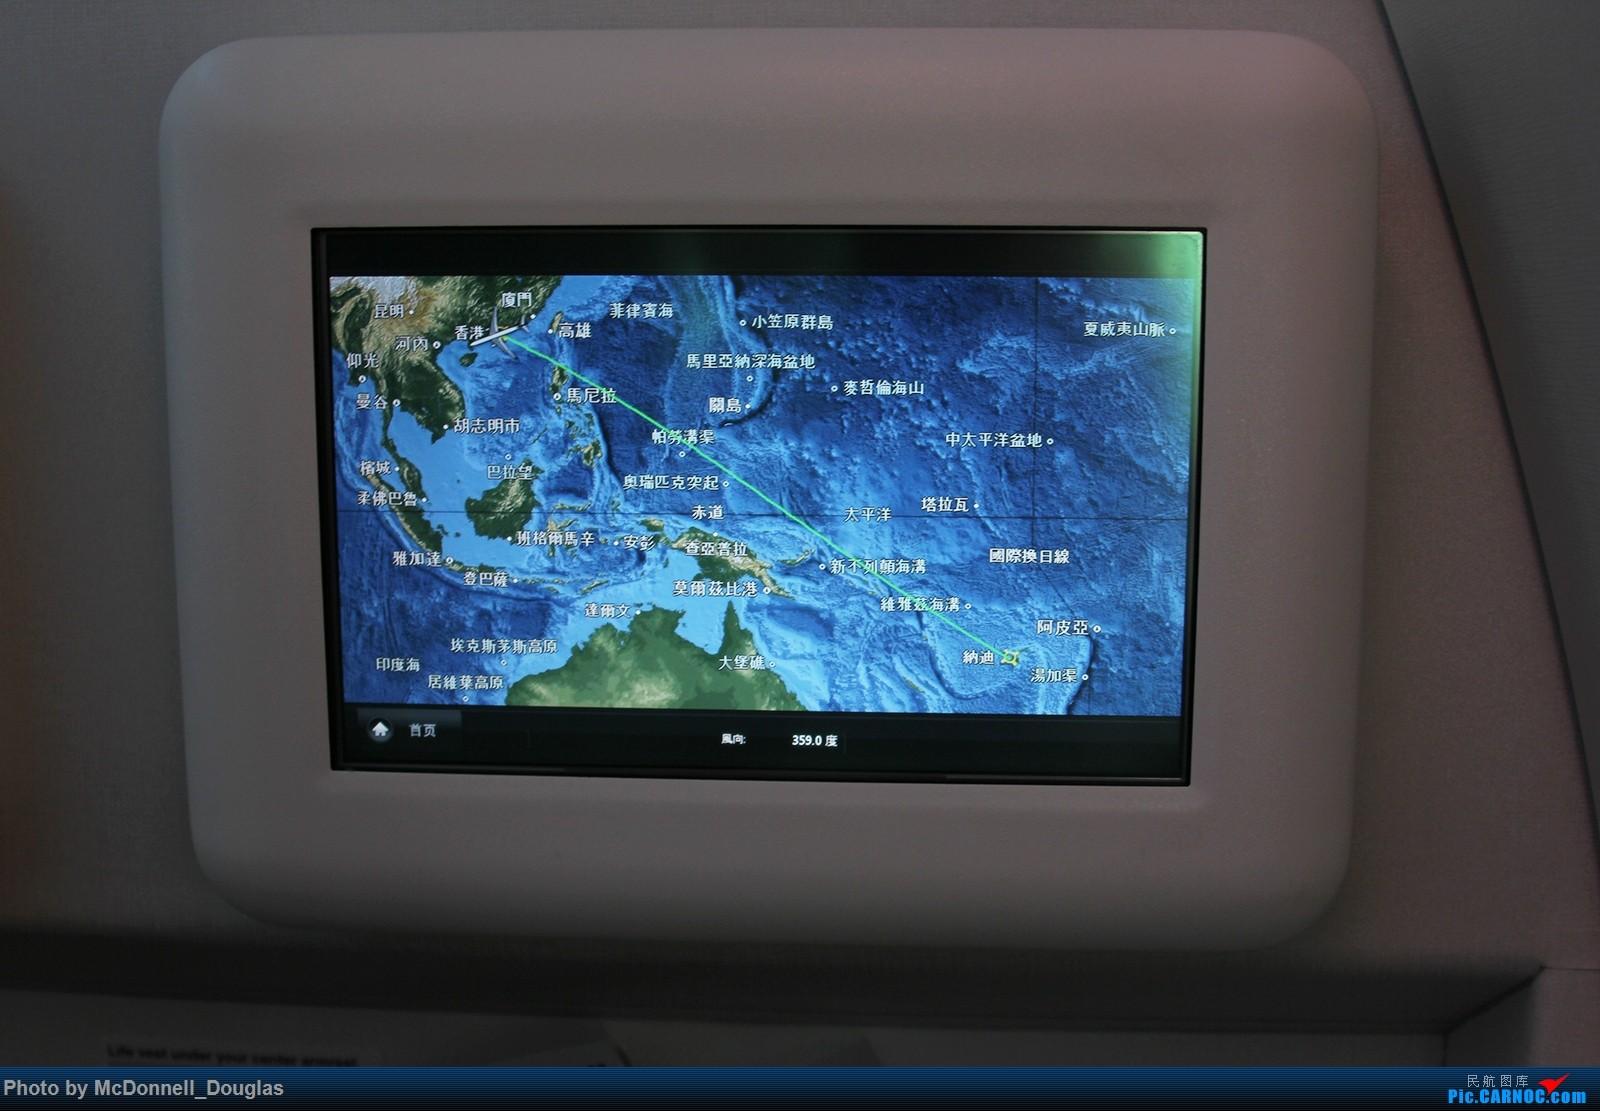 Re:[原创]【上海飞友会】【zc带你游天下(5)】起意只因一时冲动,飞过赤道去避暑,领略南太平洋别样的风光 AIRBUS A330-343 DQ-FJW 中国香港国际机场